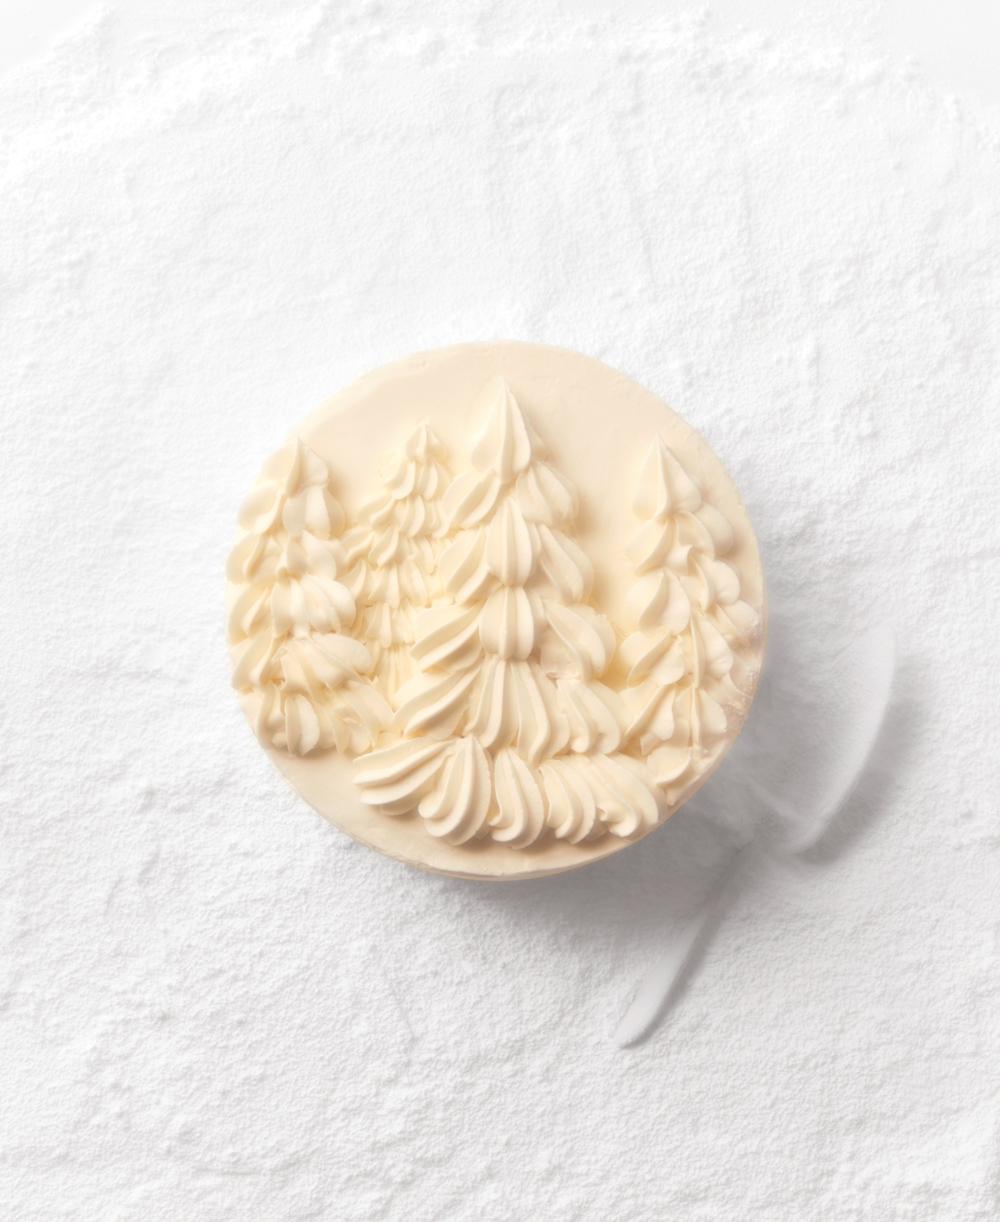 Coconut Cake, Martha Stewart Living